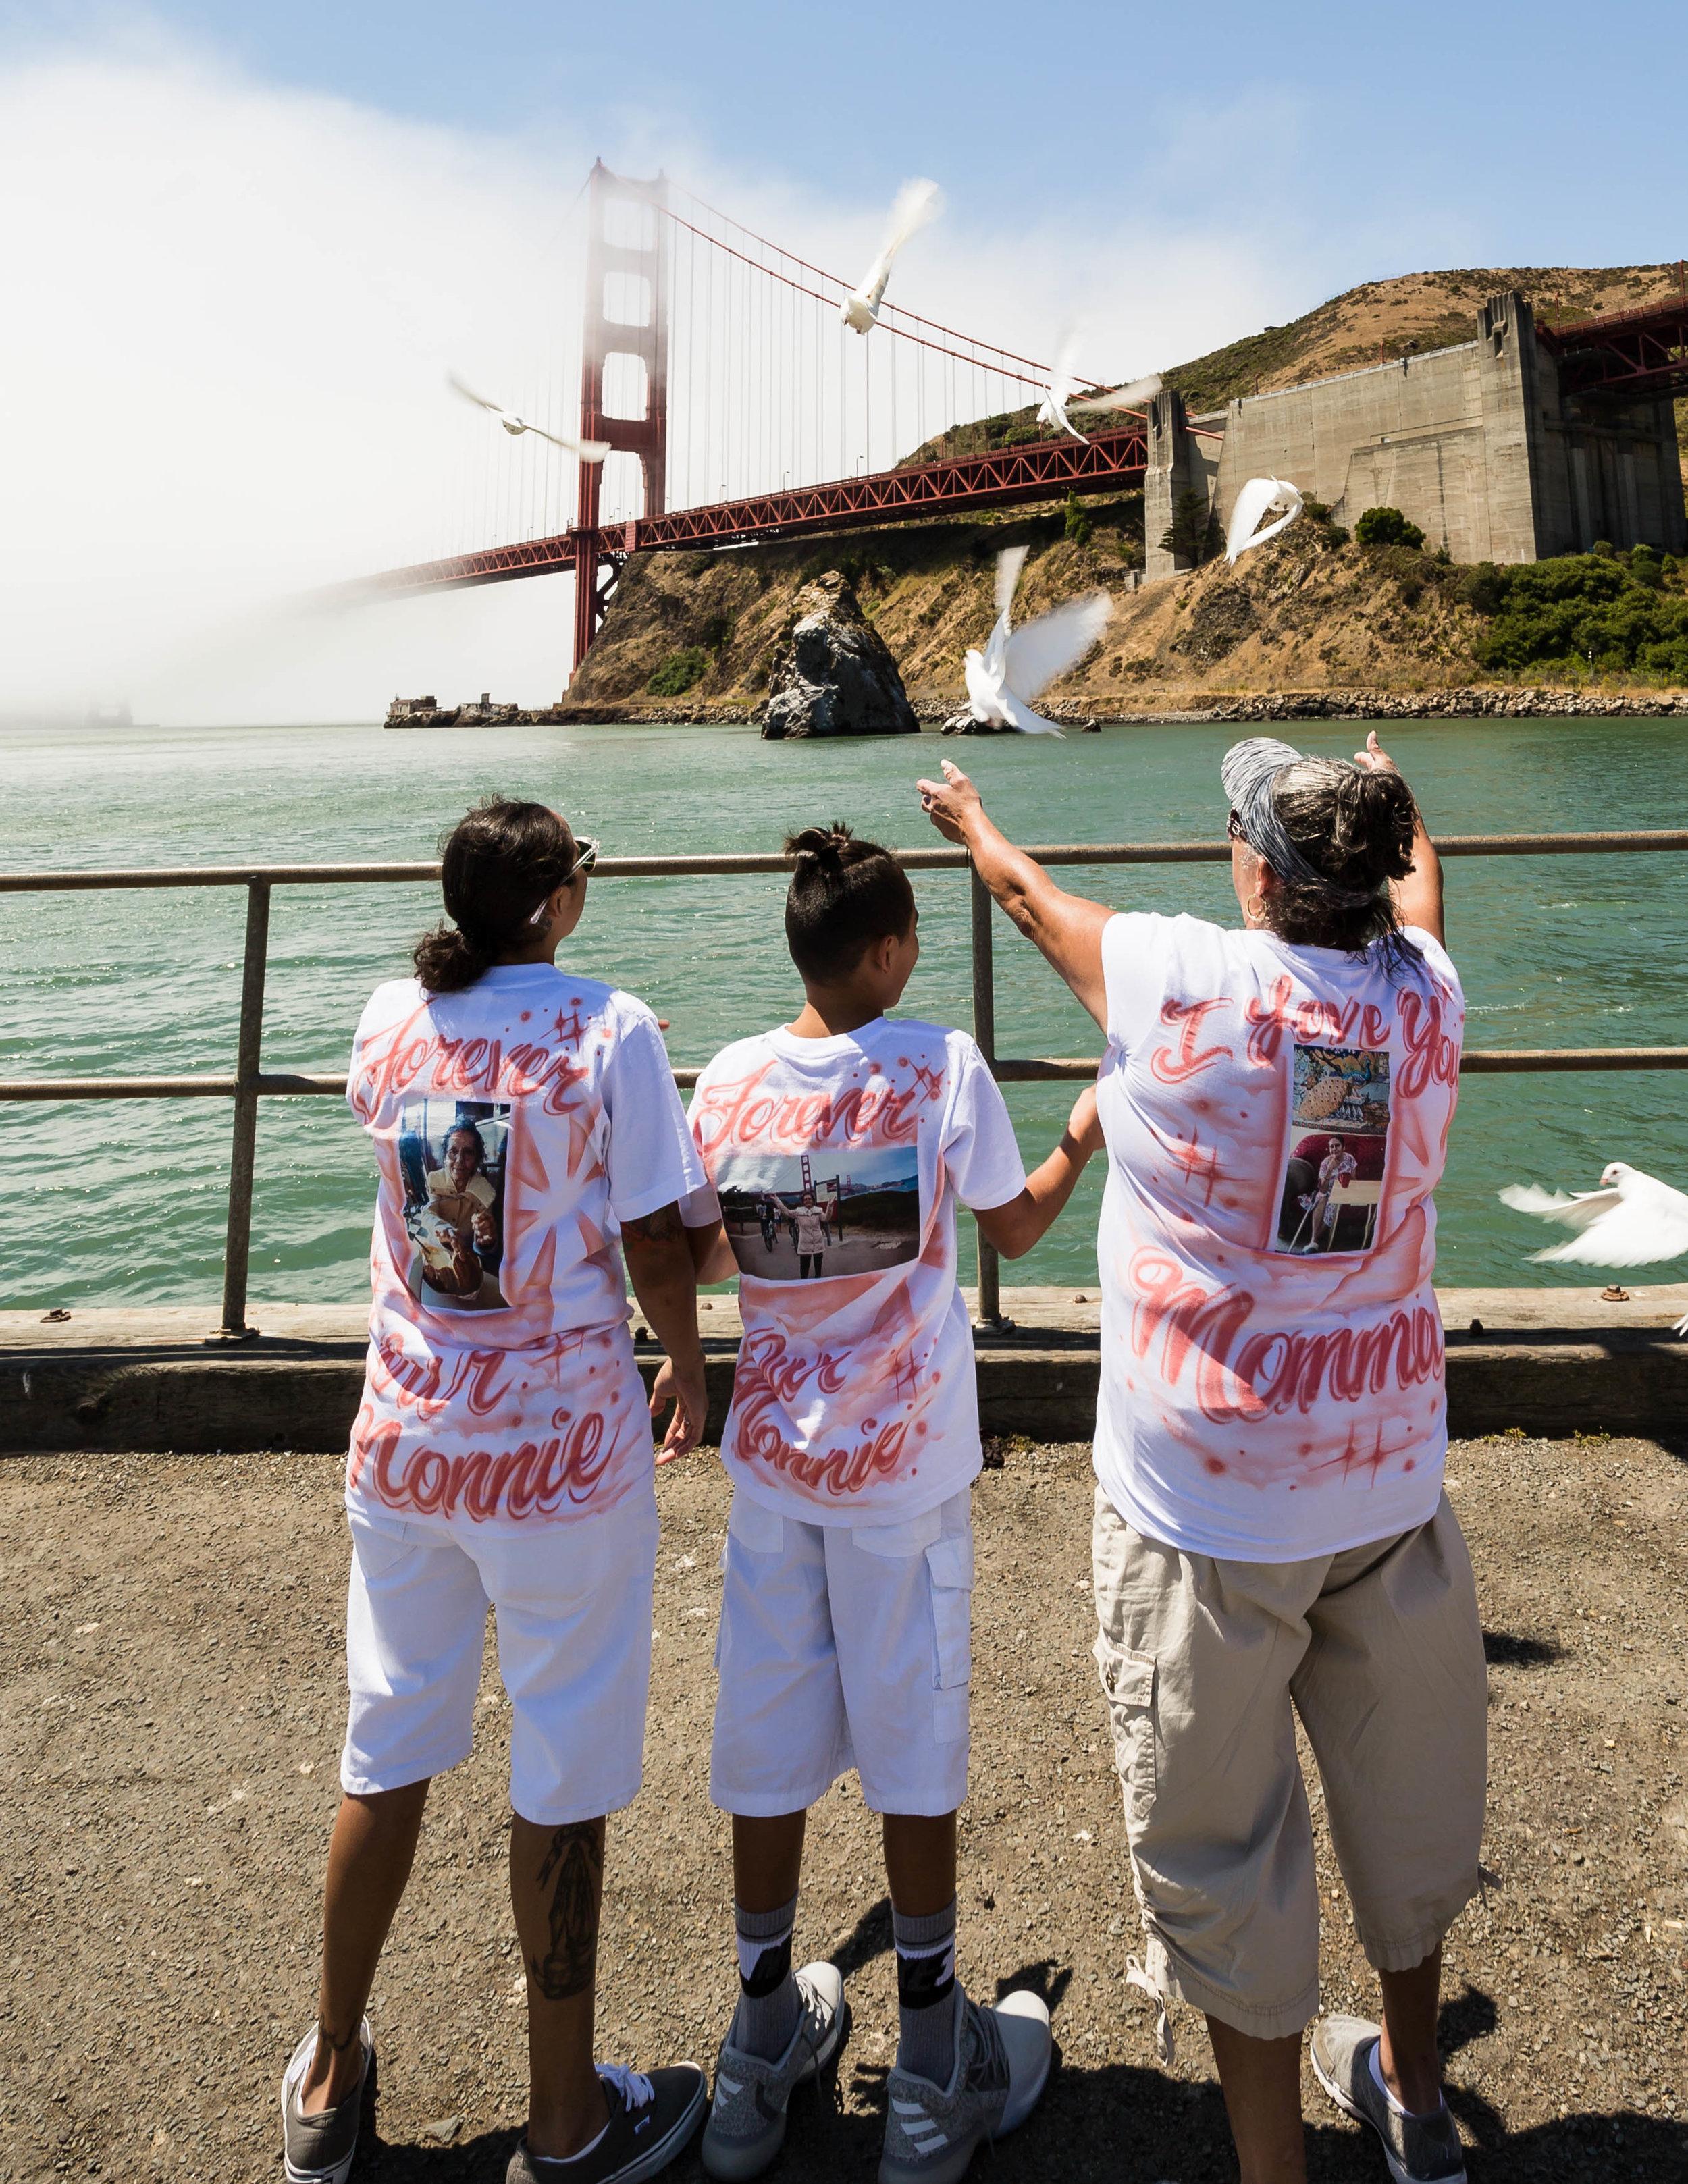 Doves Release at Golden GAte bridge, California